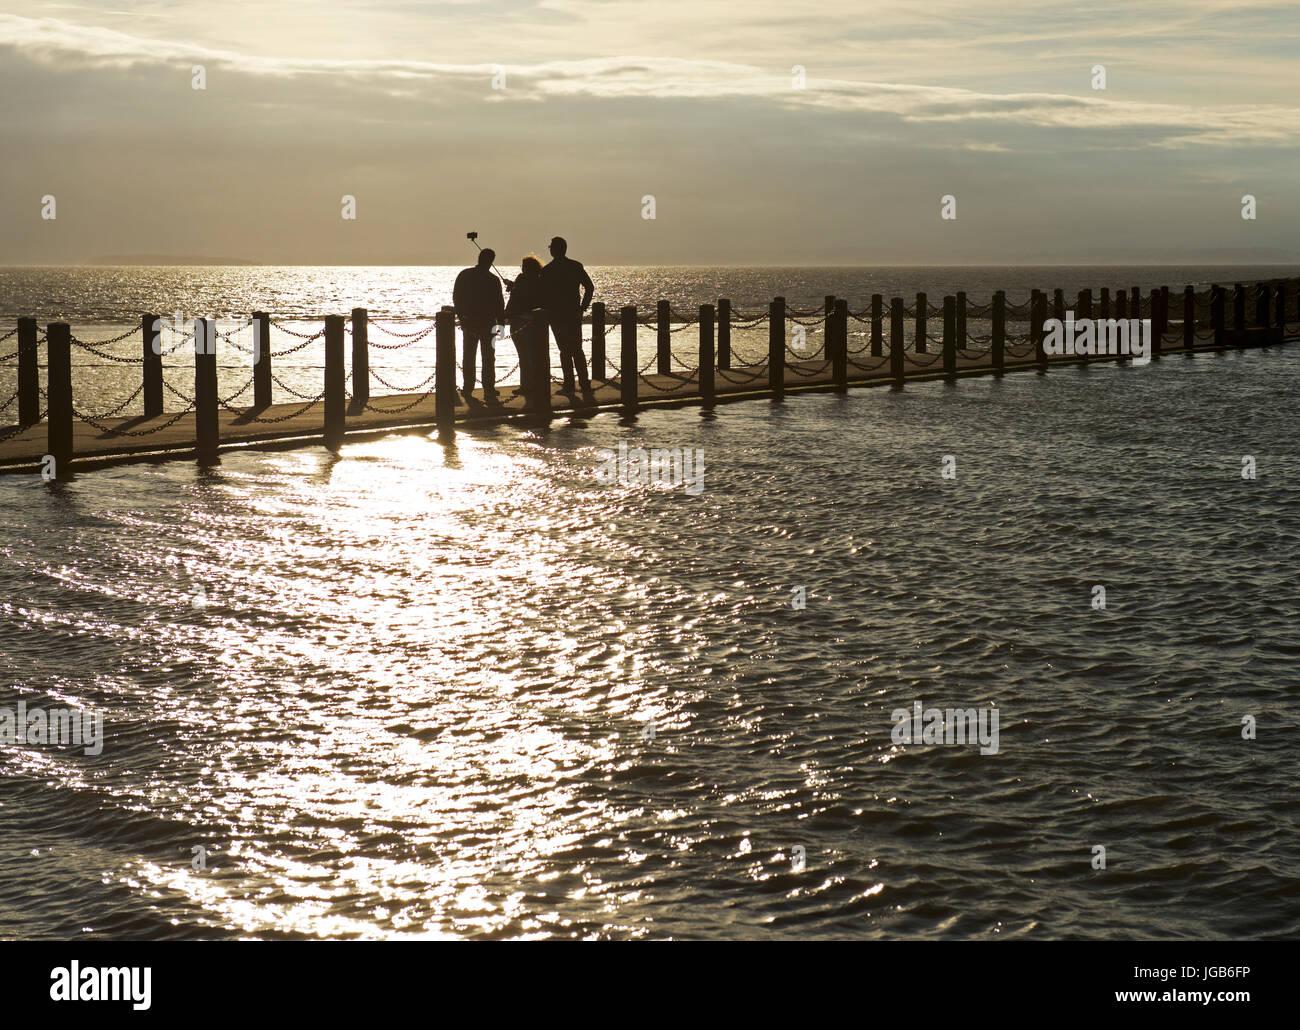 Three people taking selfie on walkway between sea and Marine Lake, Weston-super-Mare, Somerset, England UK - Stock Image